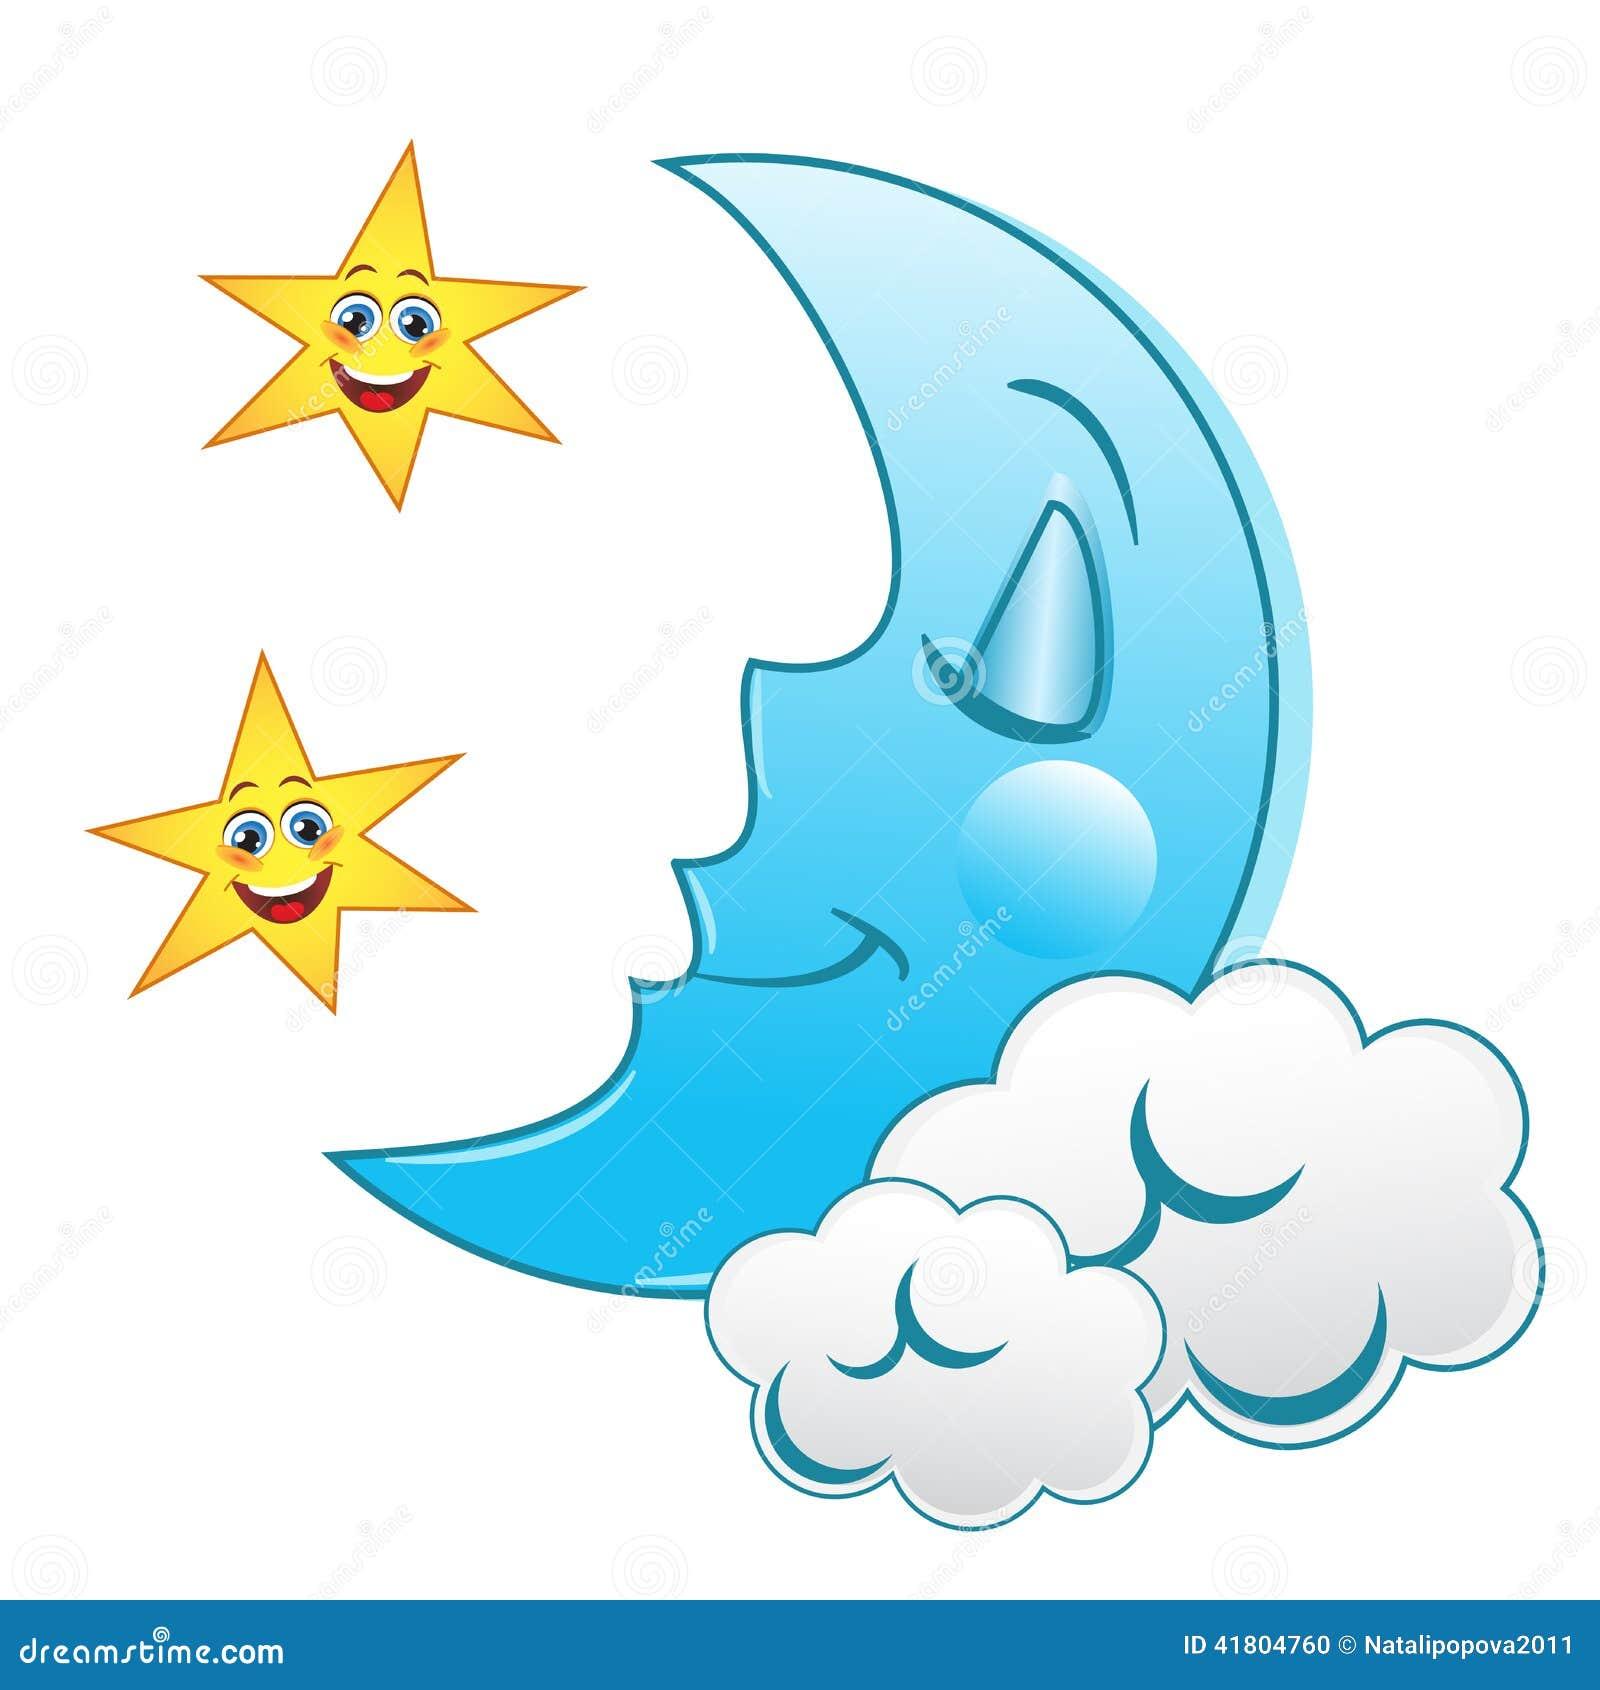 Sleeping moon stock vector. Illustration of character ...